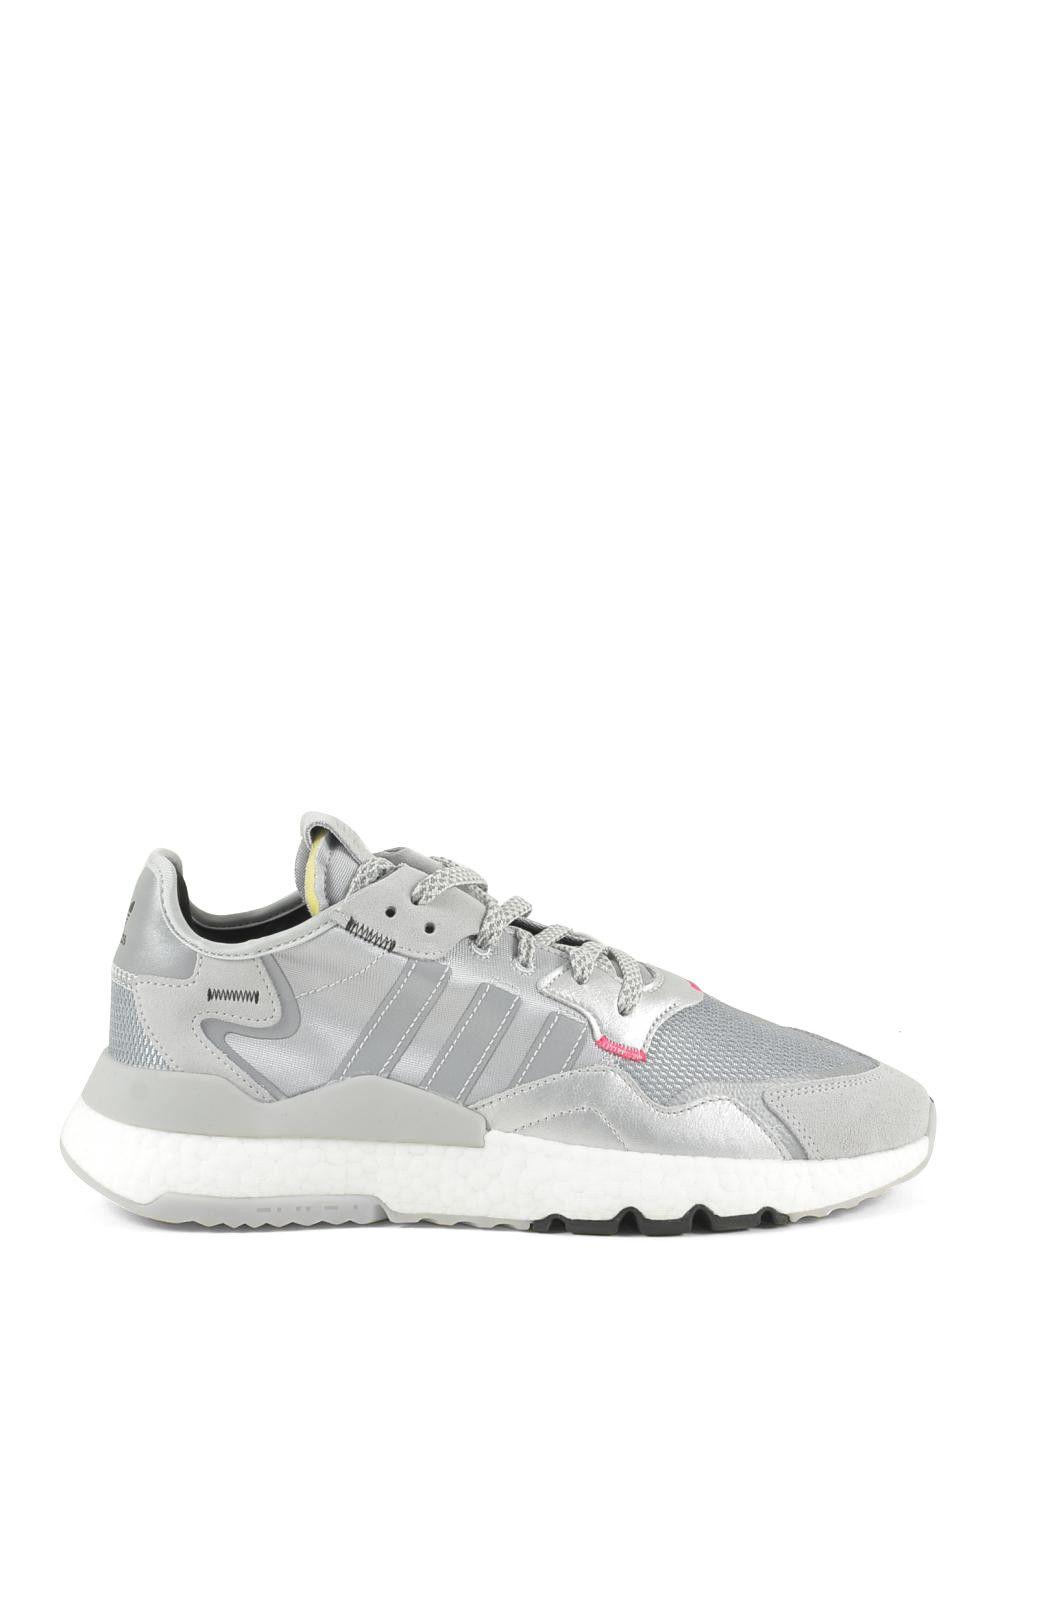 Adidas Men's Sneakers In Grey